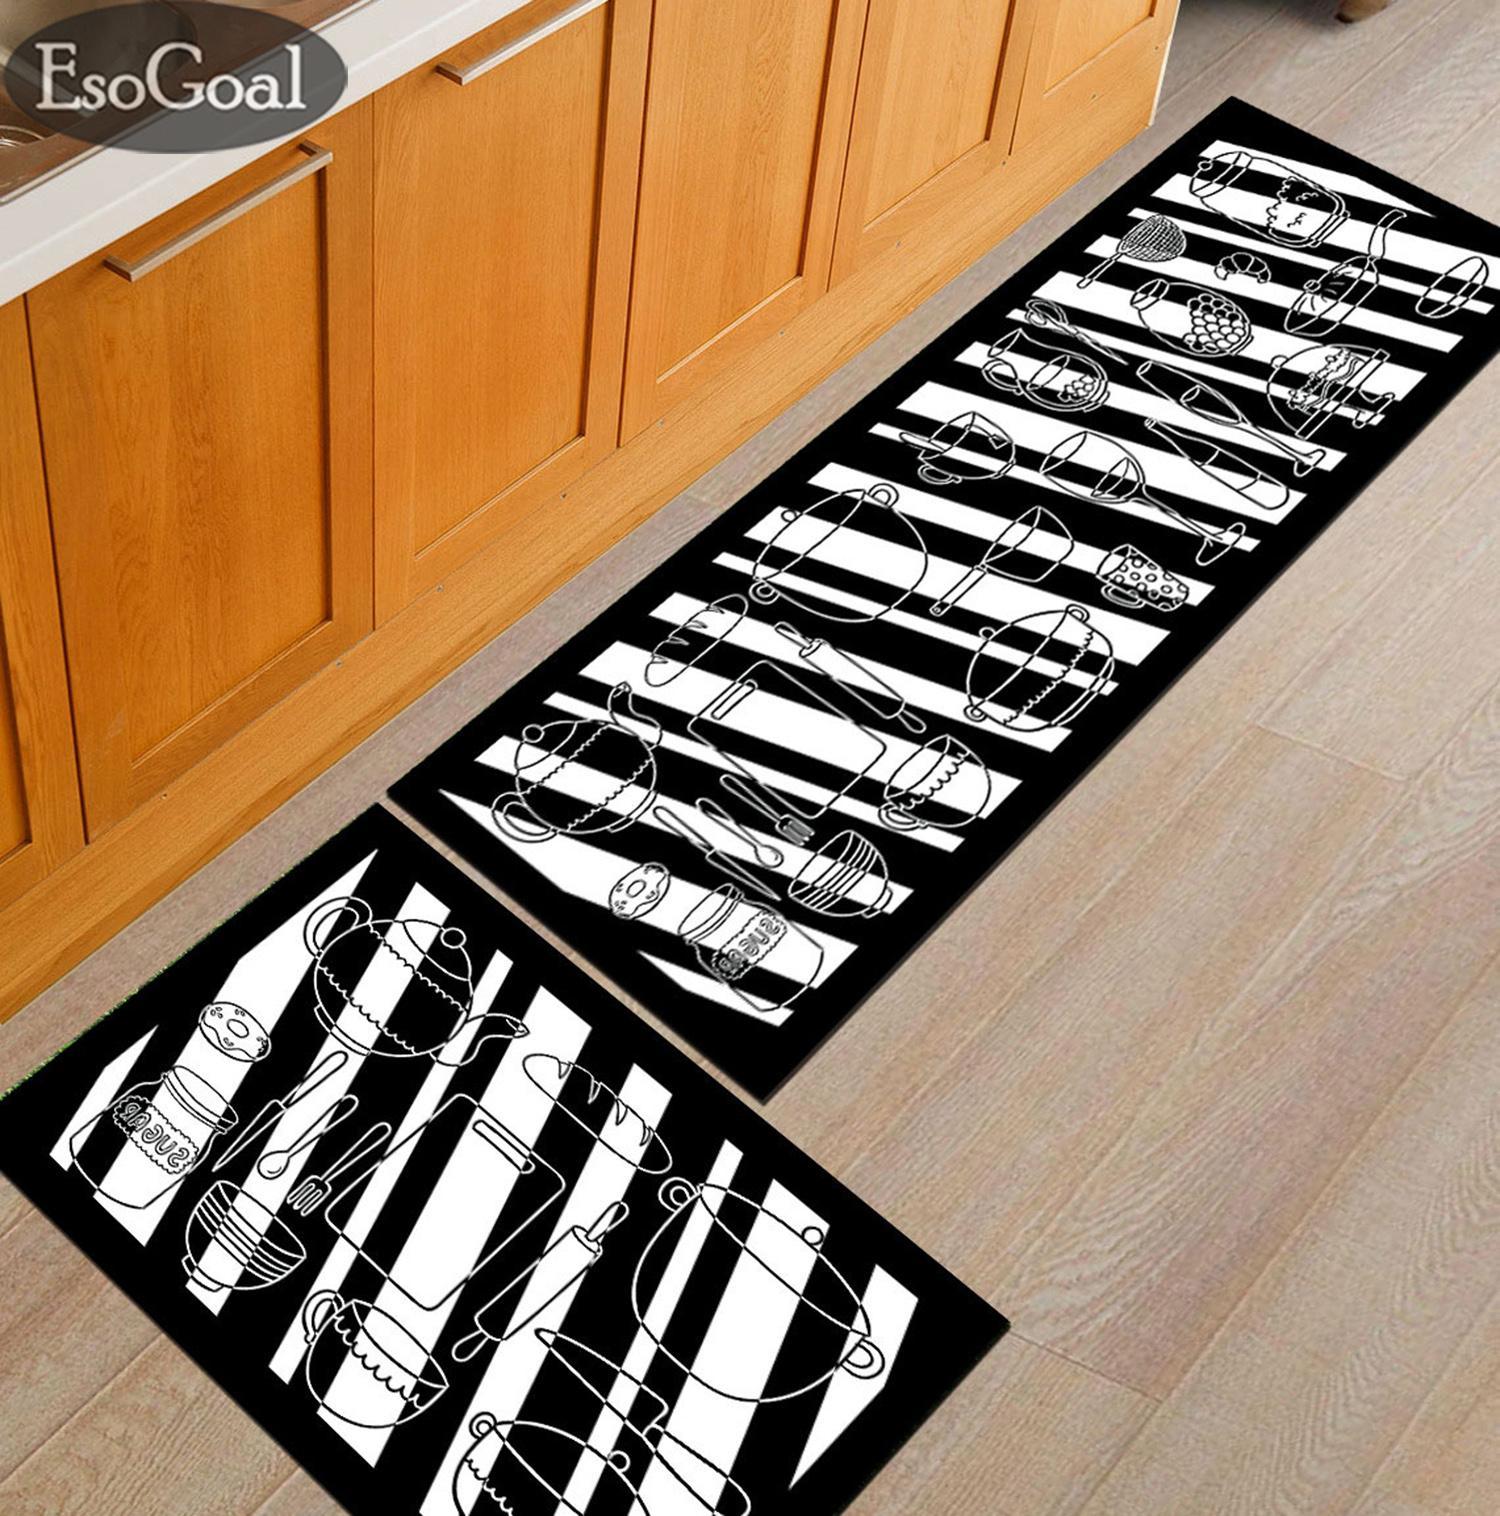 EsoGoal Kitchen Utensils Design Antislip Carpet (120cm x 40cm) Free (60 x 40cm) Soft Flannel Carpet Rug Floor Mat Kitchen Dapur and Bathroom